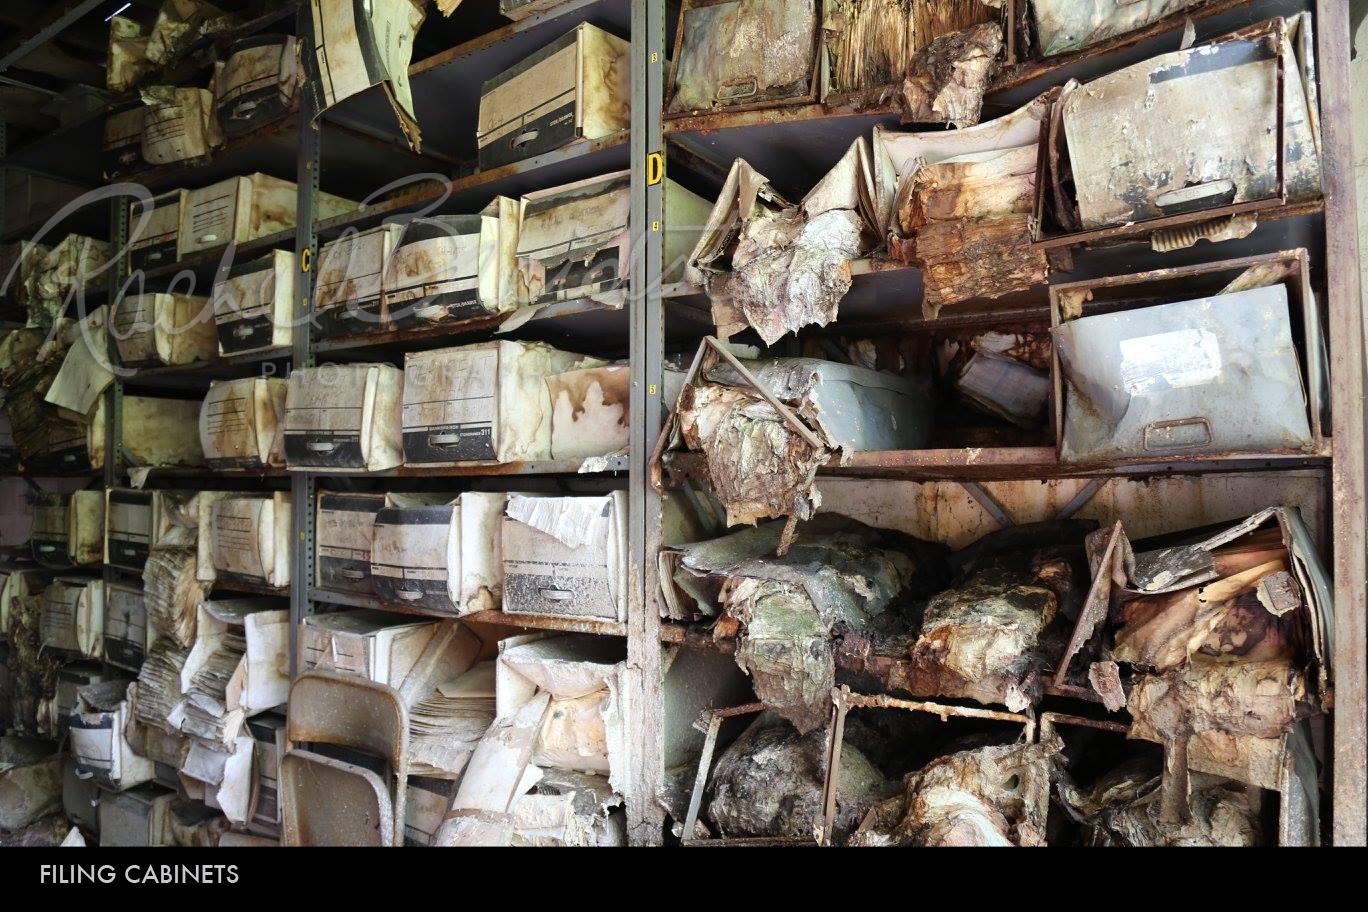 Filing-Cabinets2.jpg